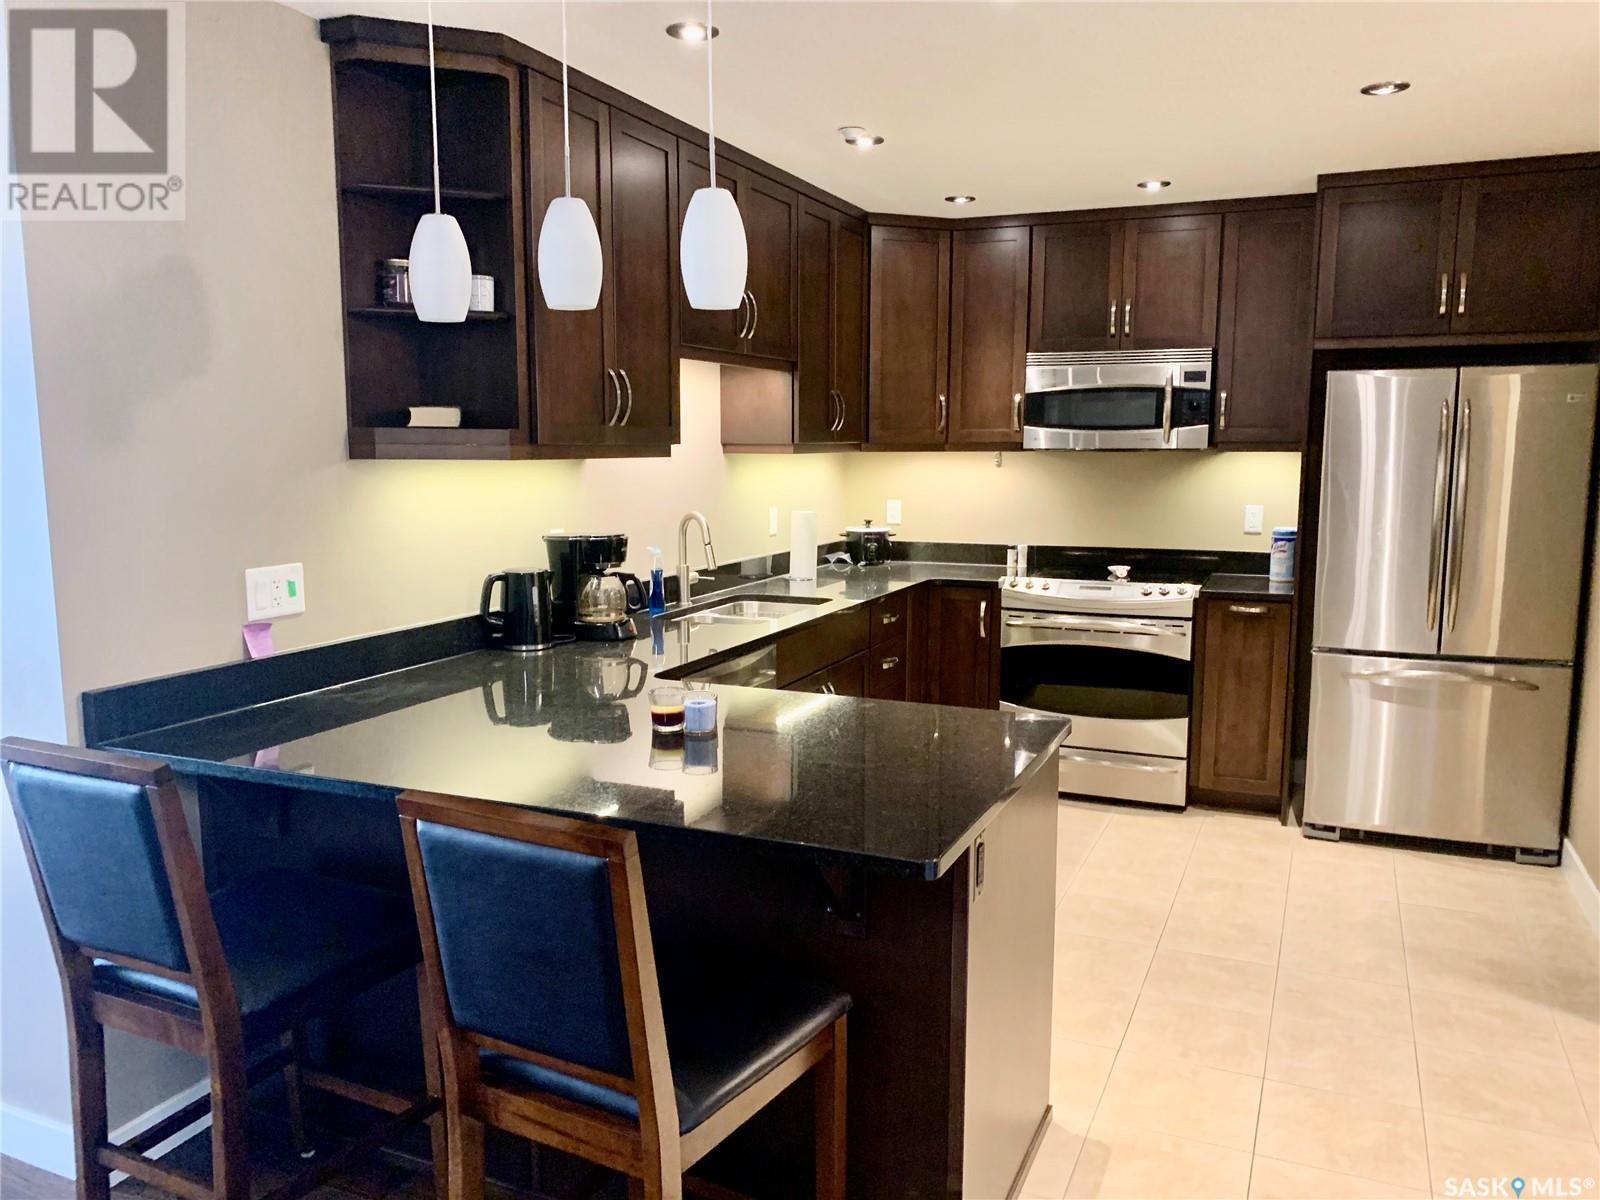 303 2300 Broad Street Regina Sk Apt Condo For Sale Rew